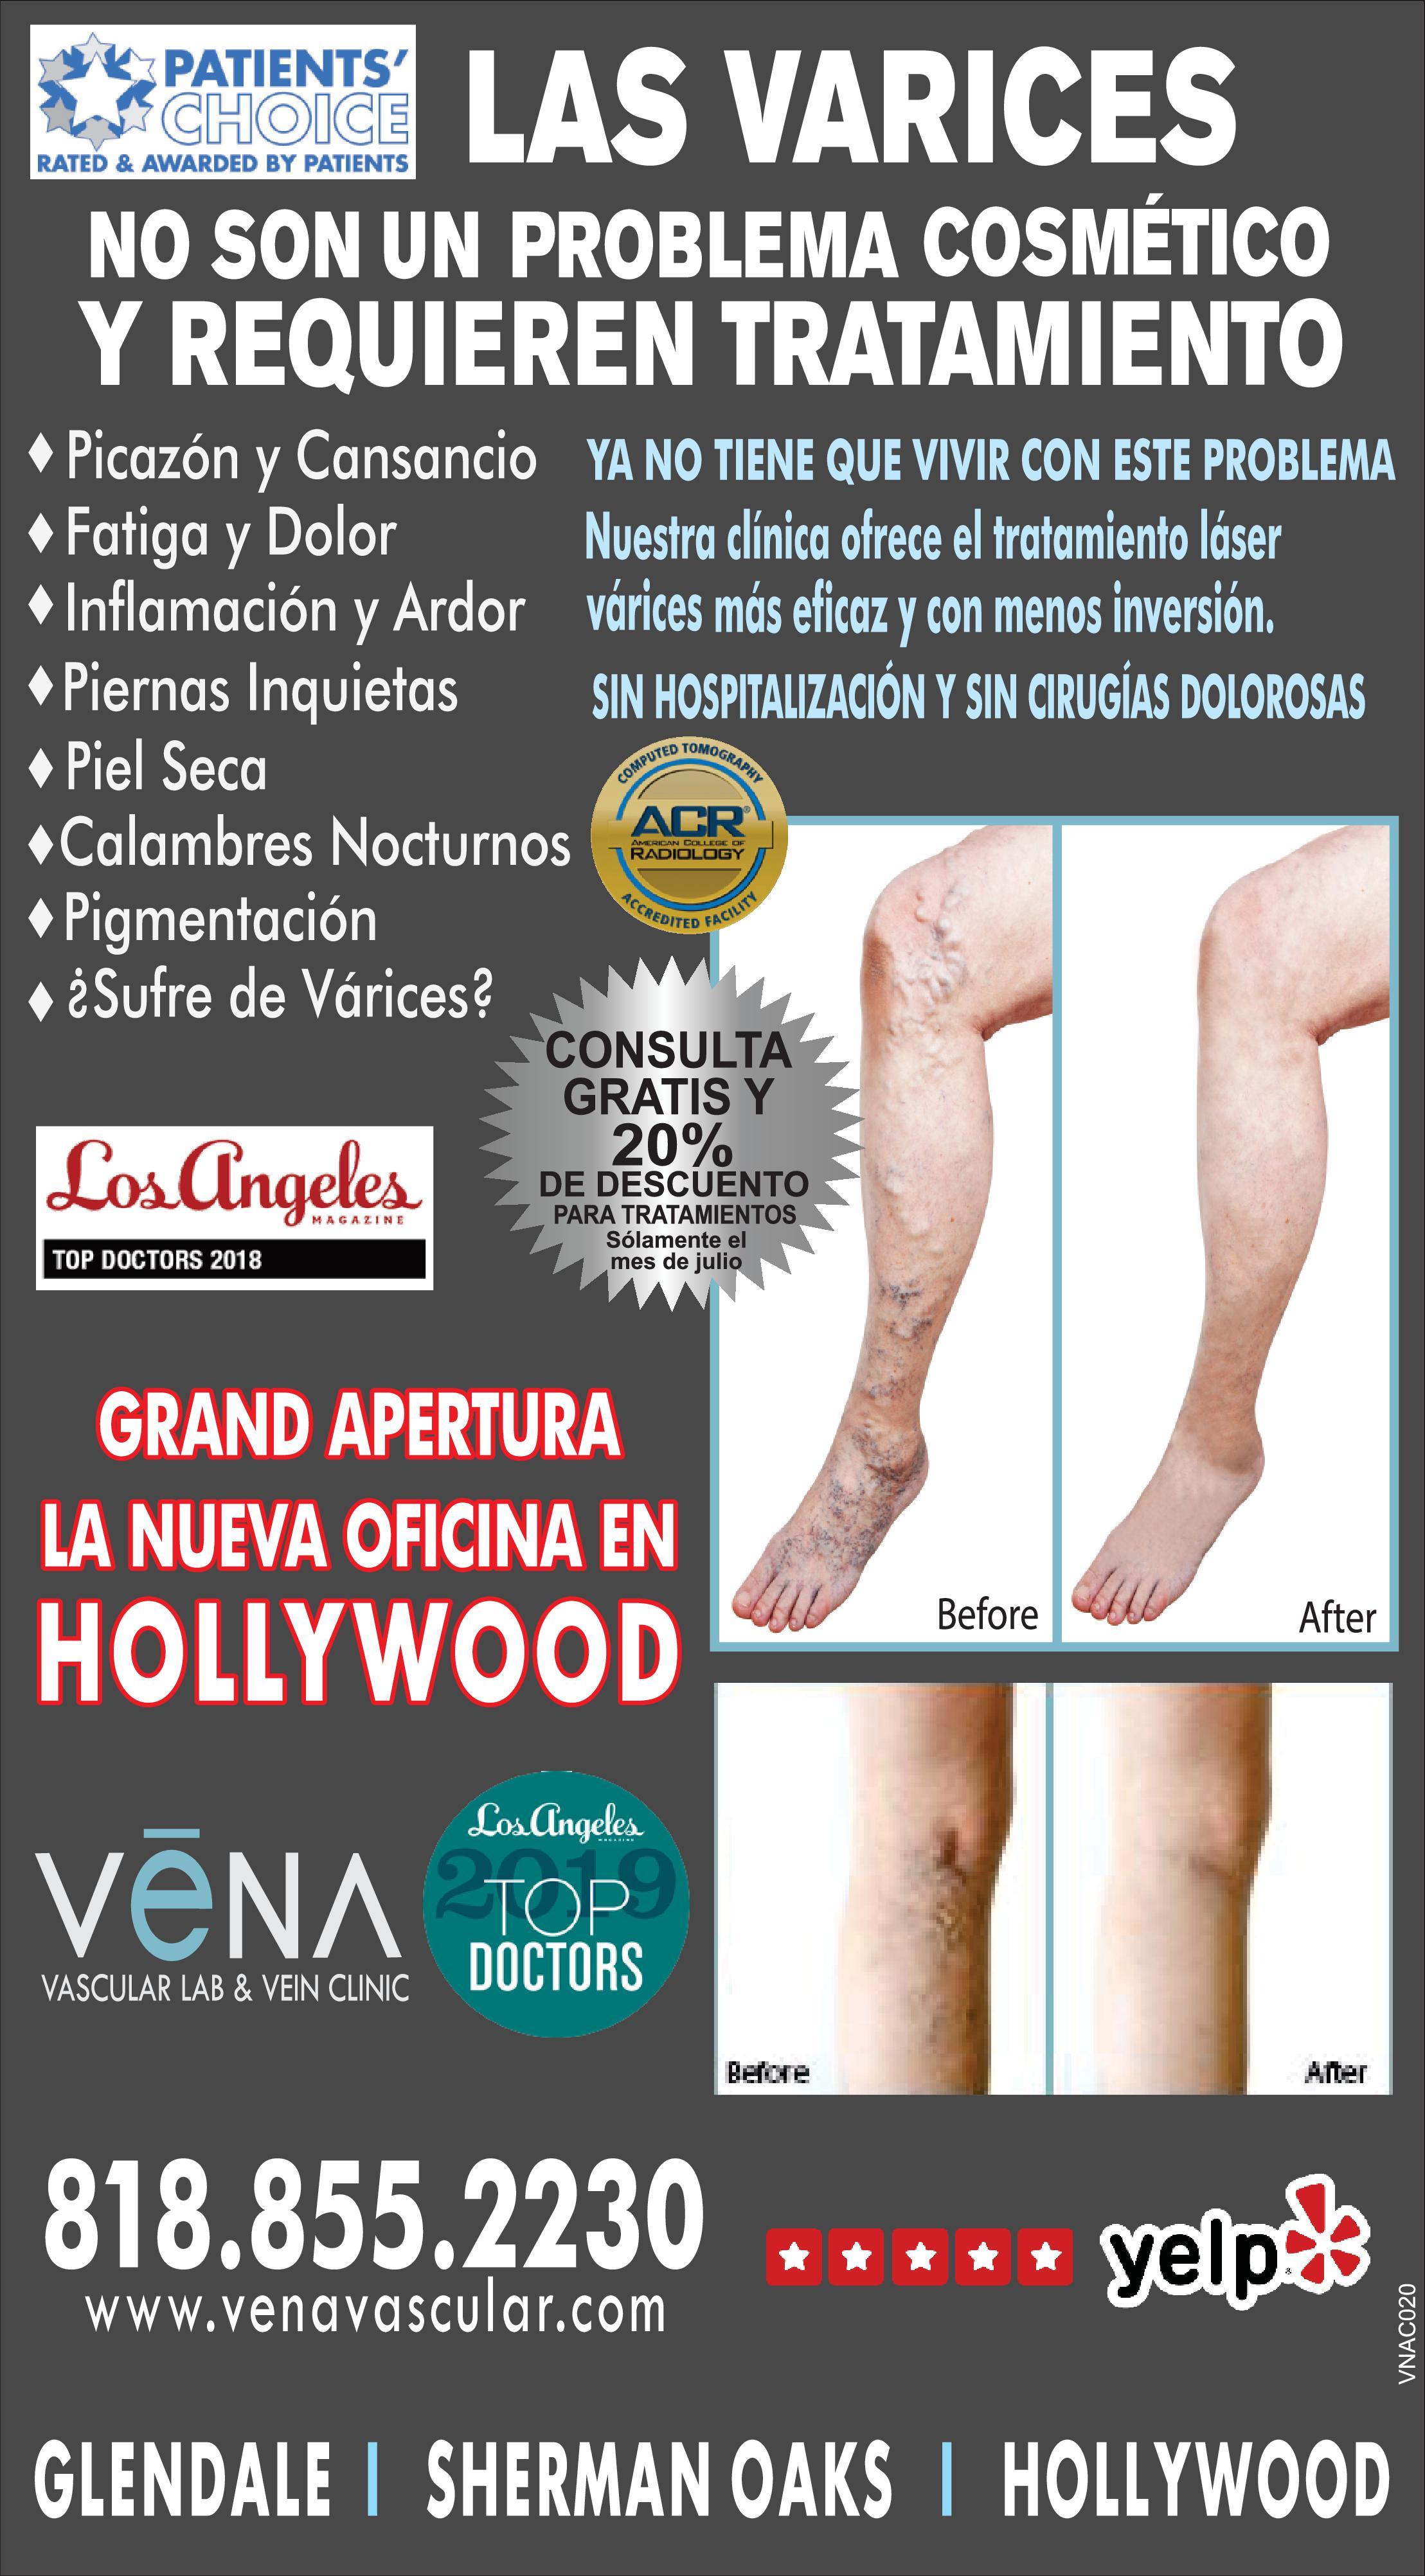 Vena Vascular Clinic